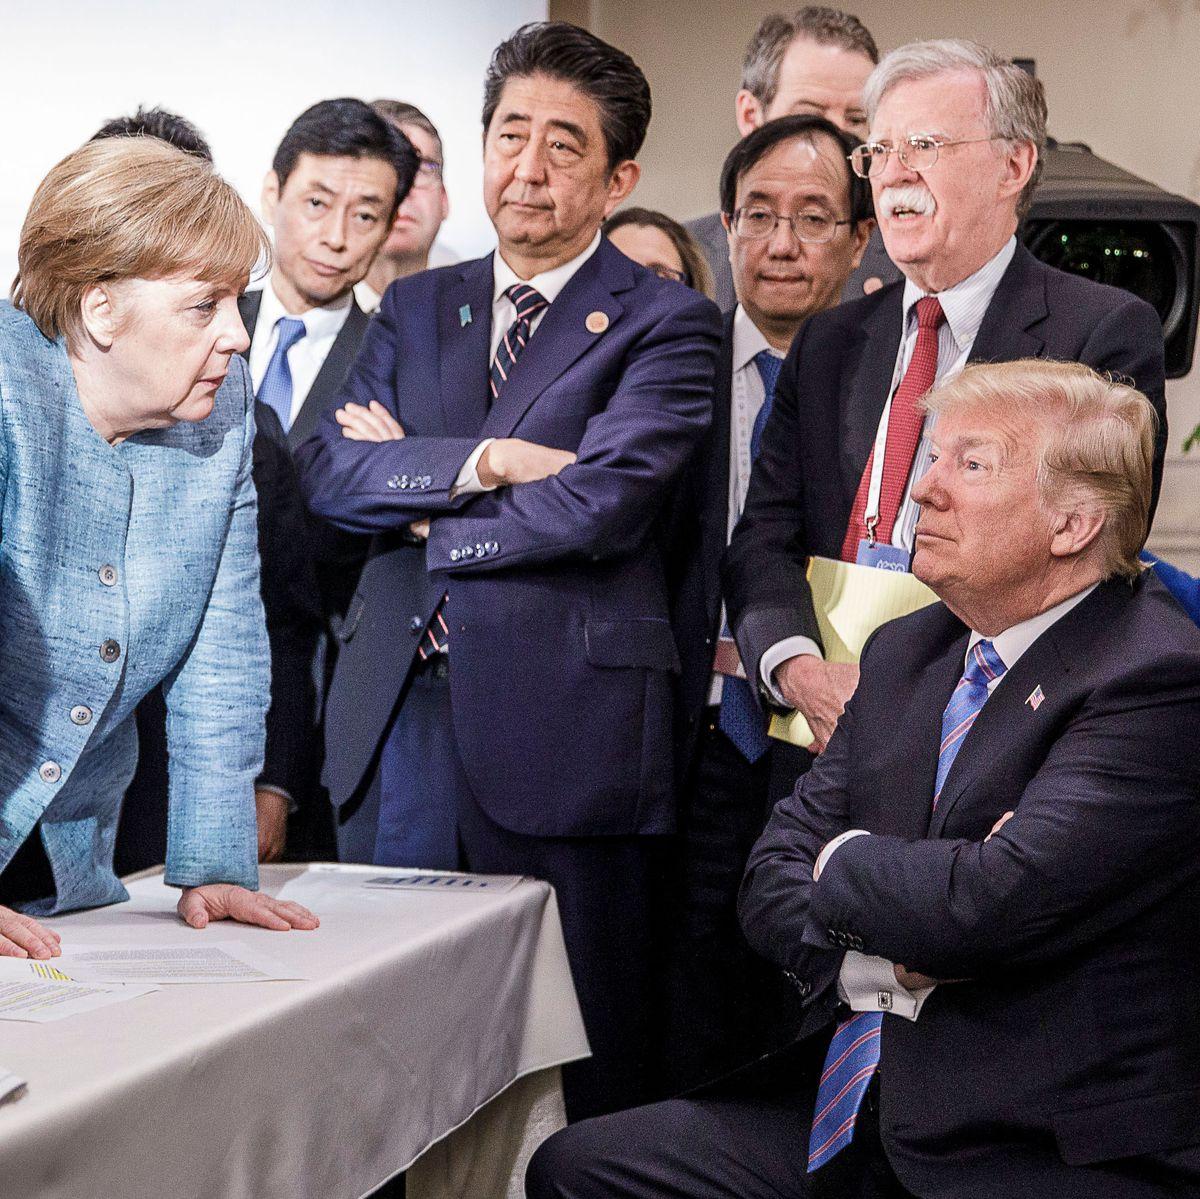 Trump Had Starburst Outburst With Merkel At G7 Summit